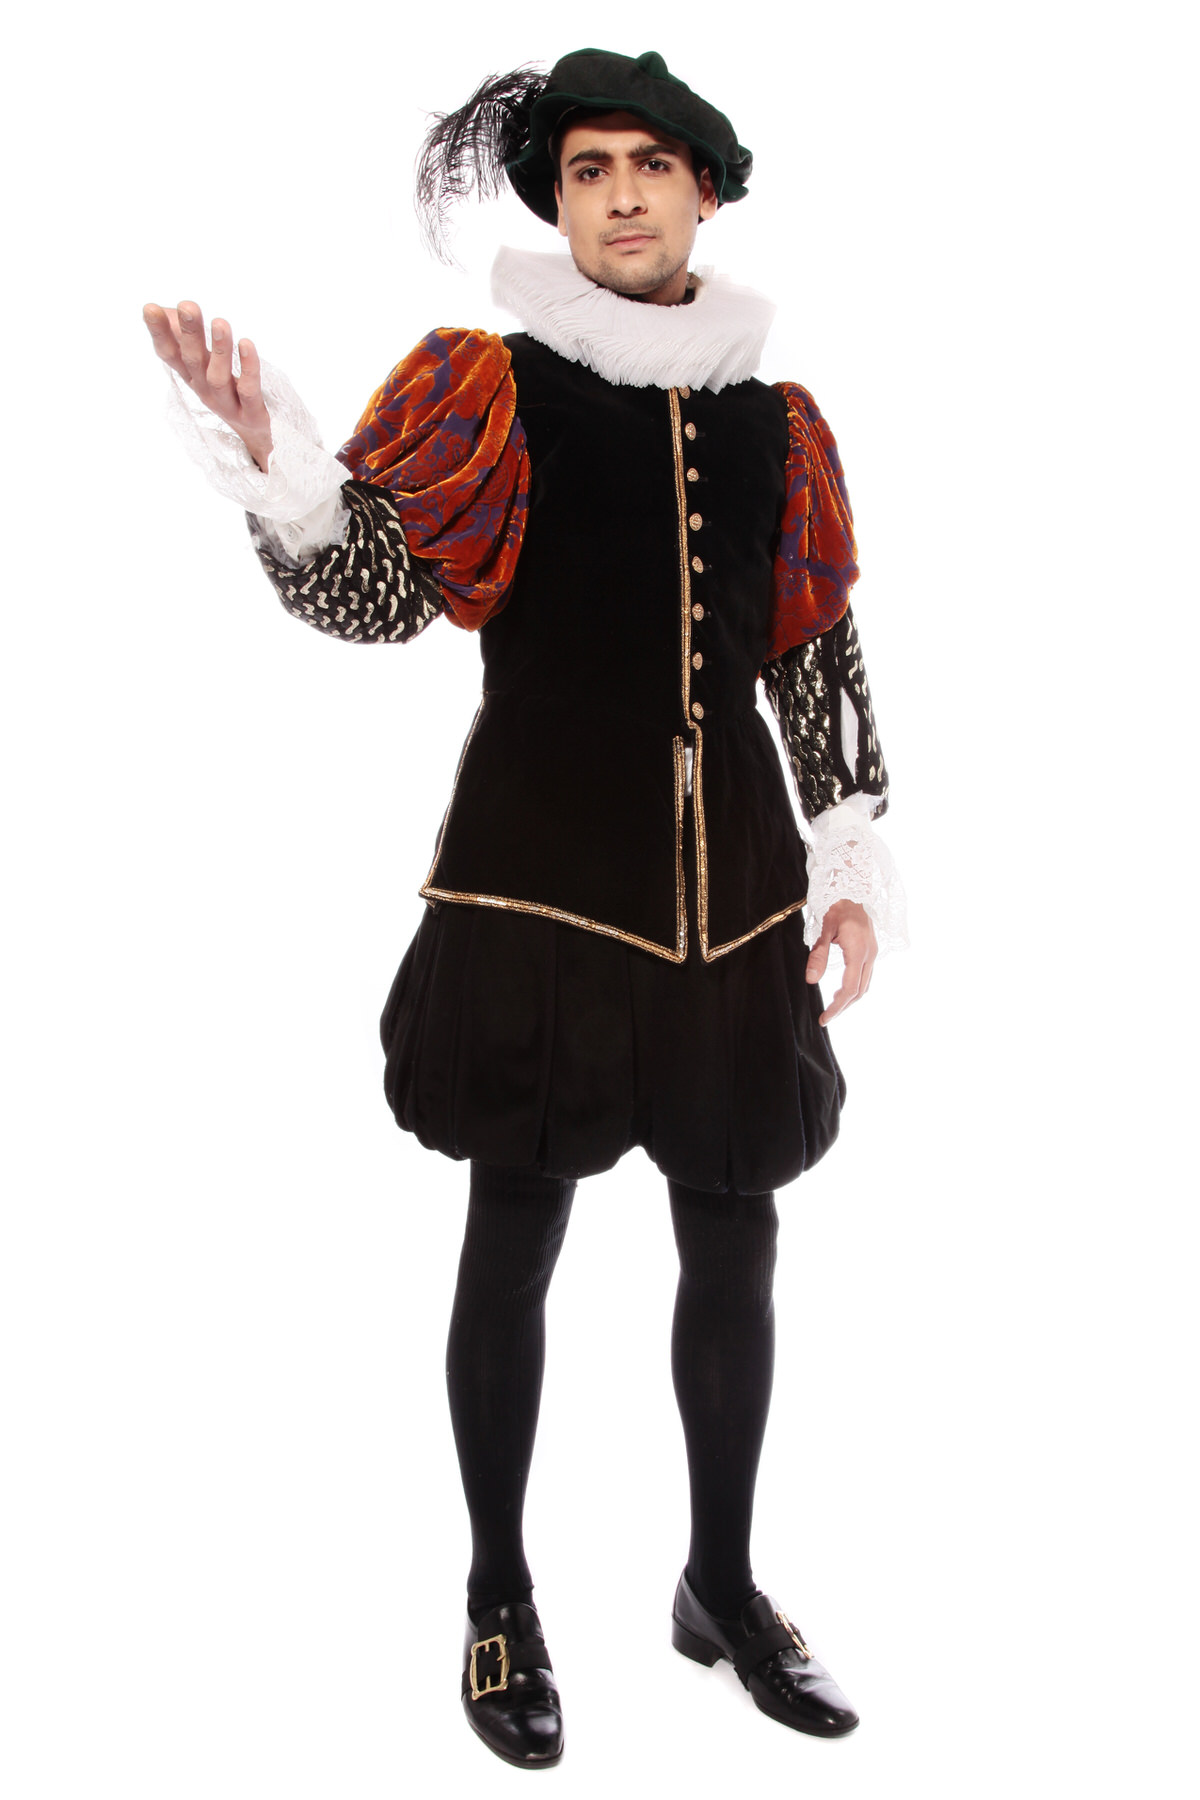 ELIZABETHAN MAN BLACKADDER COSTUME